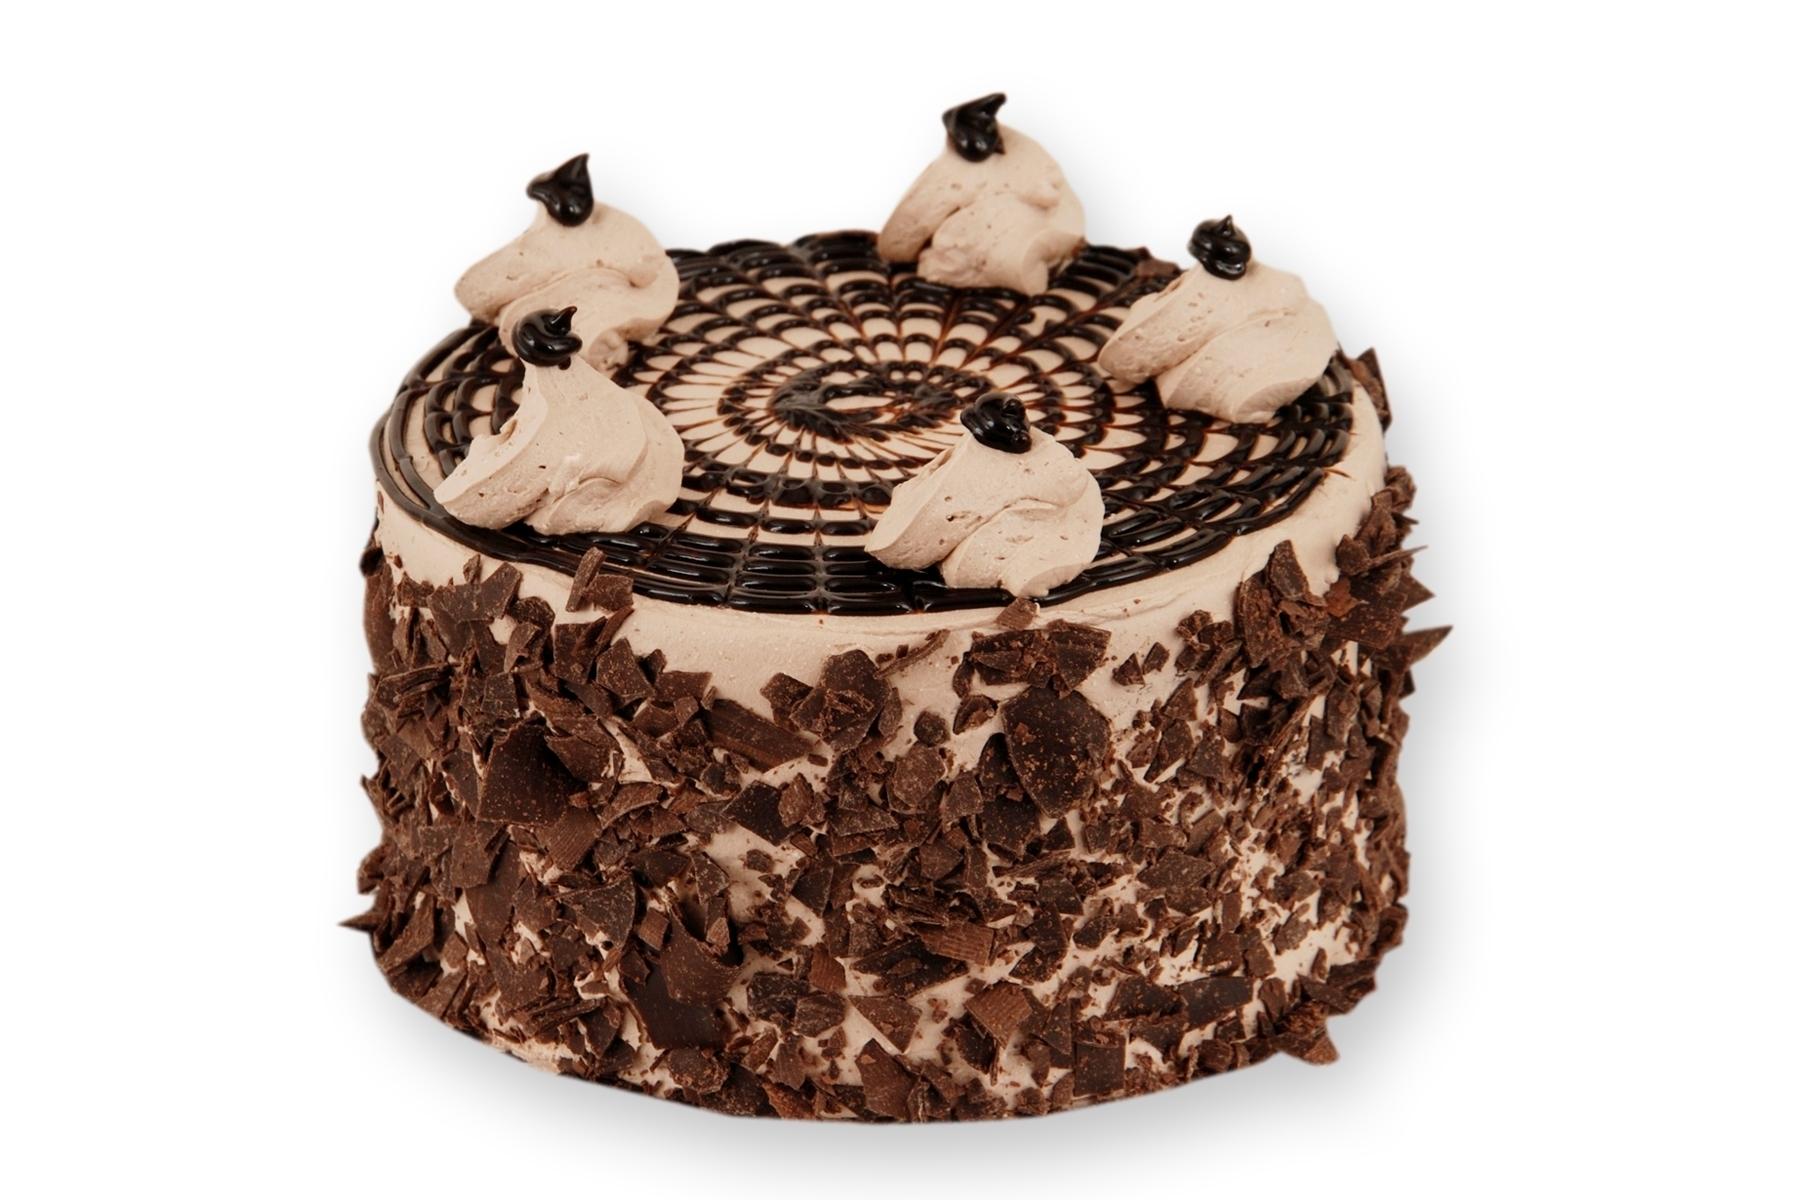 Choco Delight Cake in Pune Designs, Images, Price